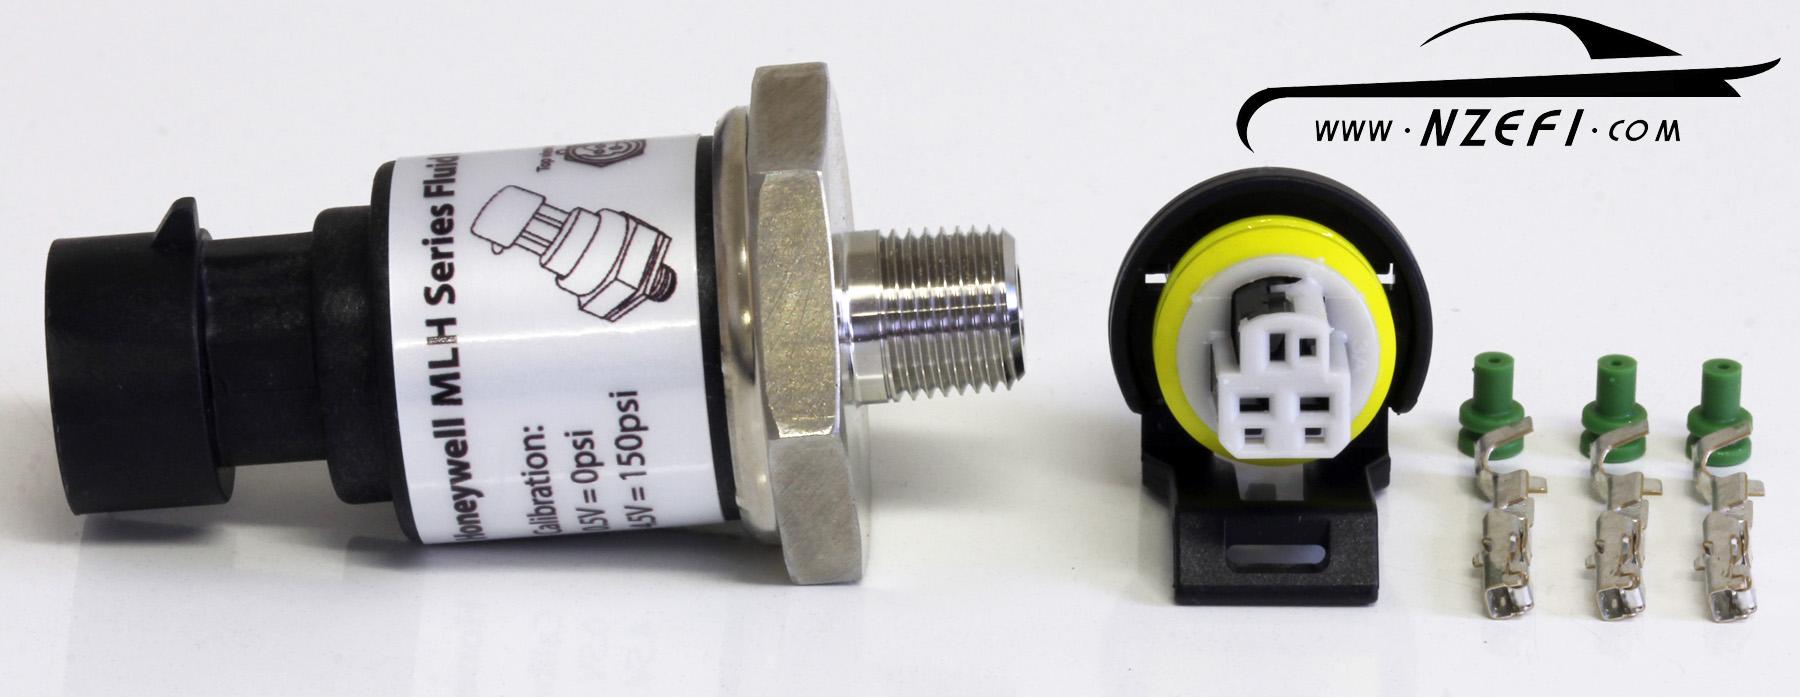 Honeywell 150 Psi Oil Pressure Sensor Nzefi Performance Tuning R33 Ecu Wiring Diagram With Connector